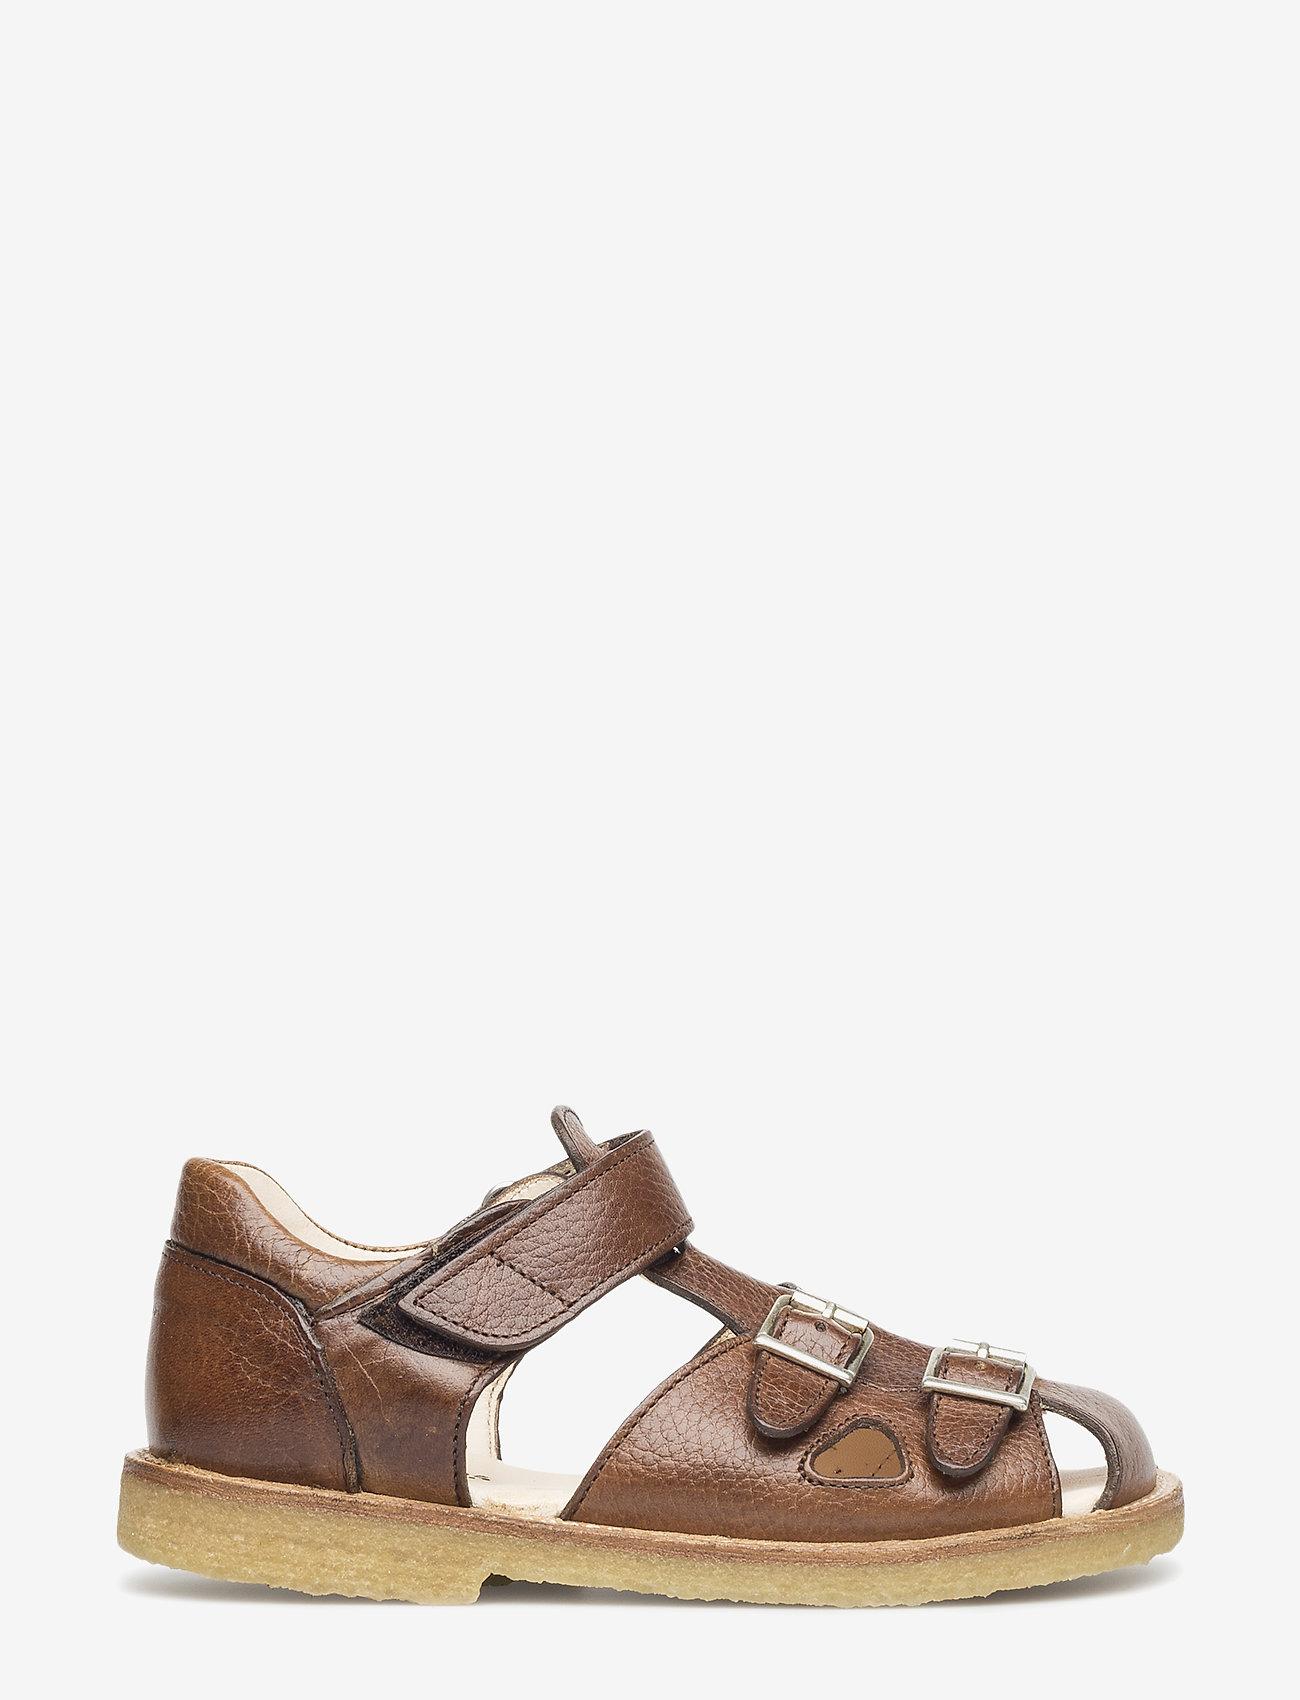 ANGULUS - Sandals - flat - closed toe -  - sandały z paskiem - 2509 cognac - 1